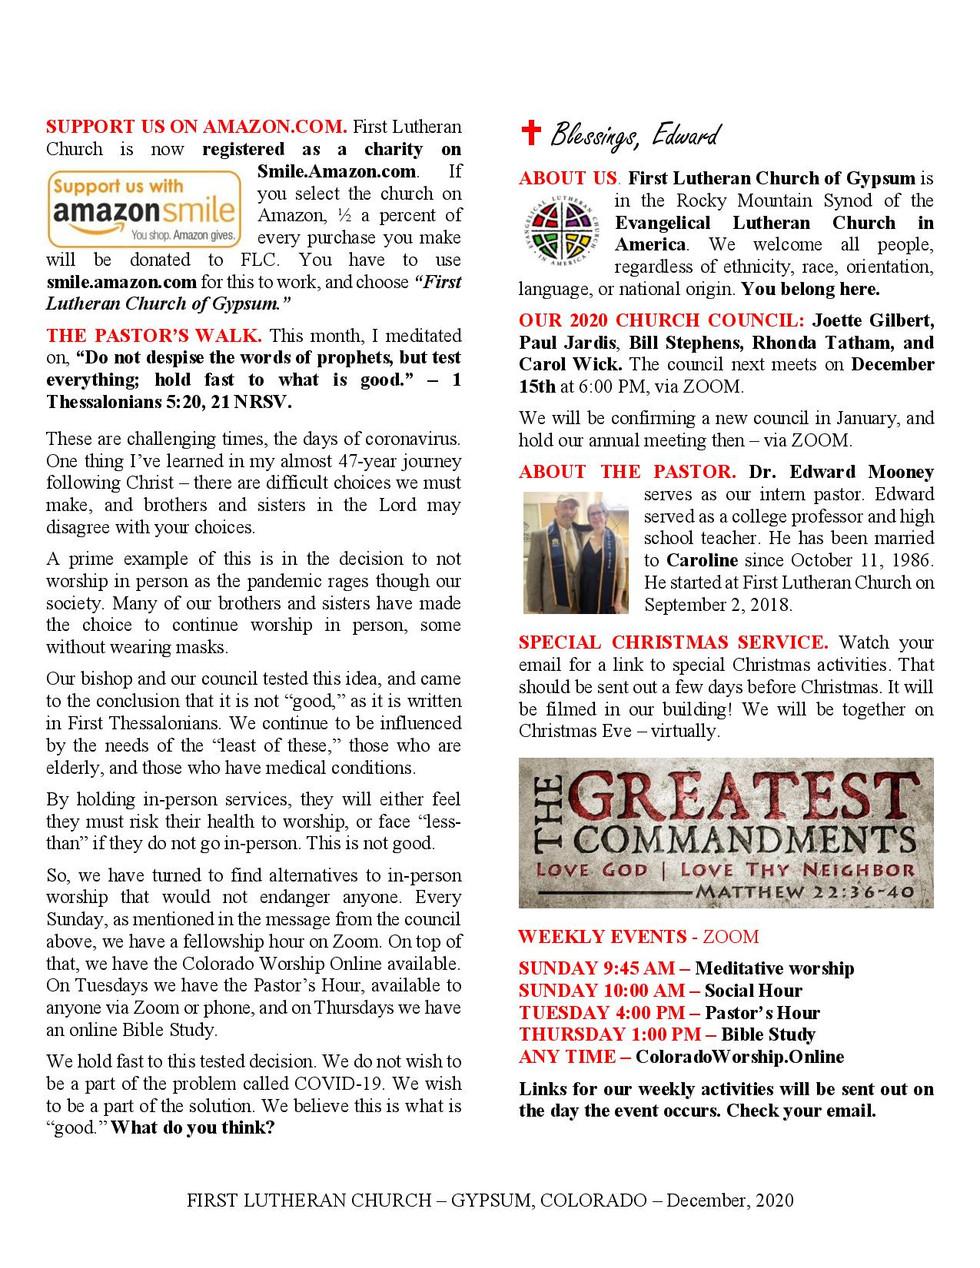 Newsletter, December, 2020, page 2